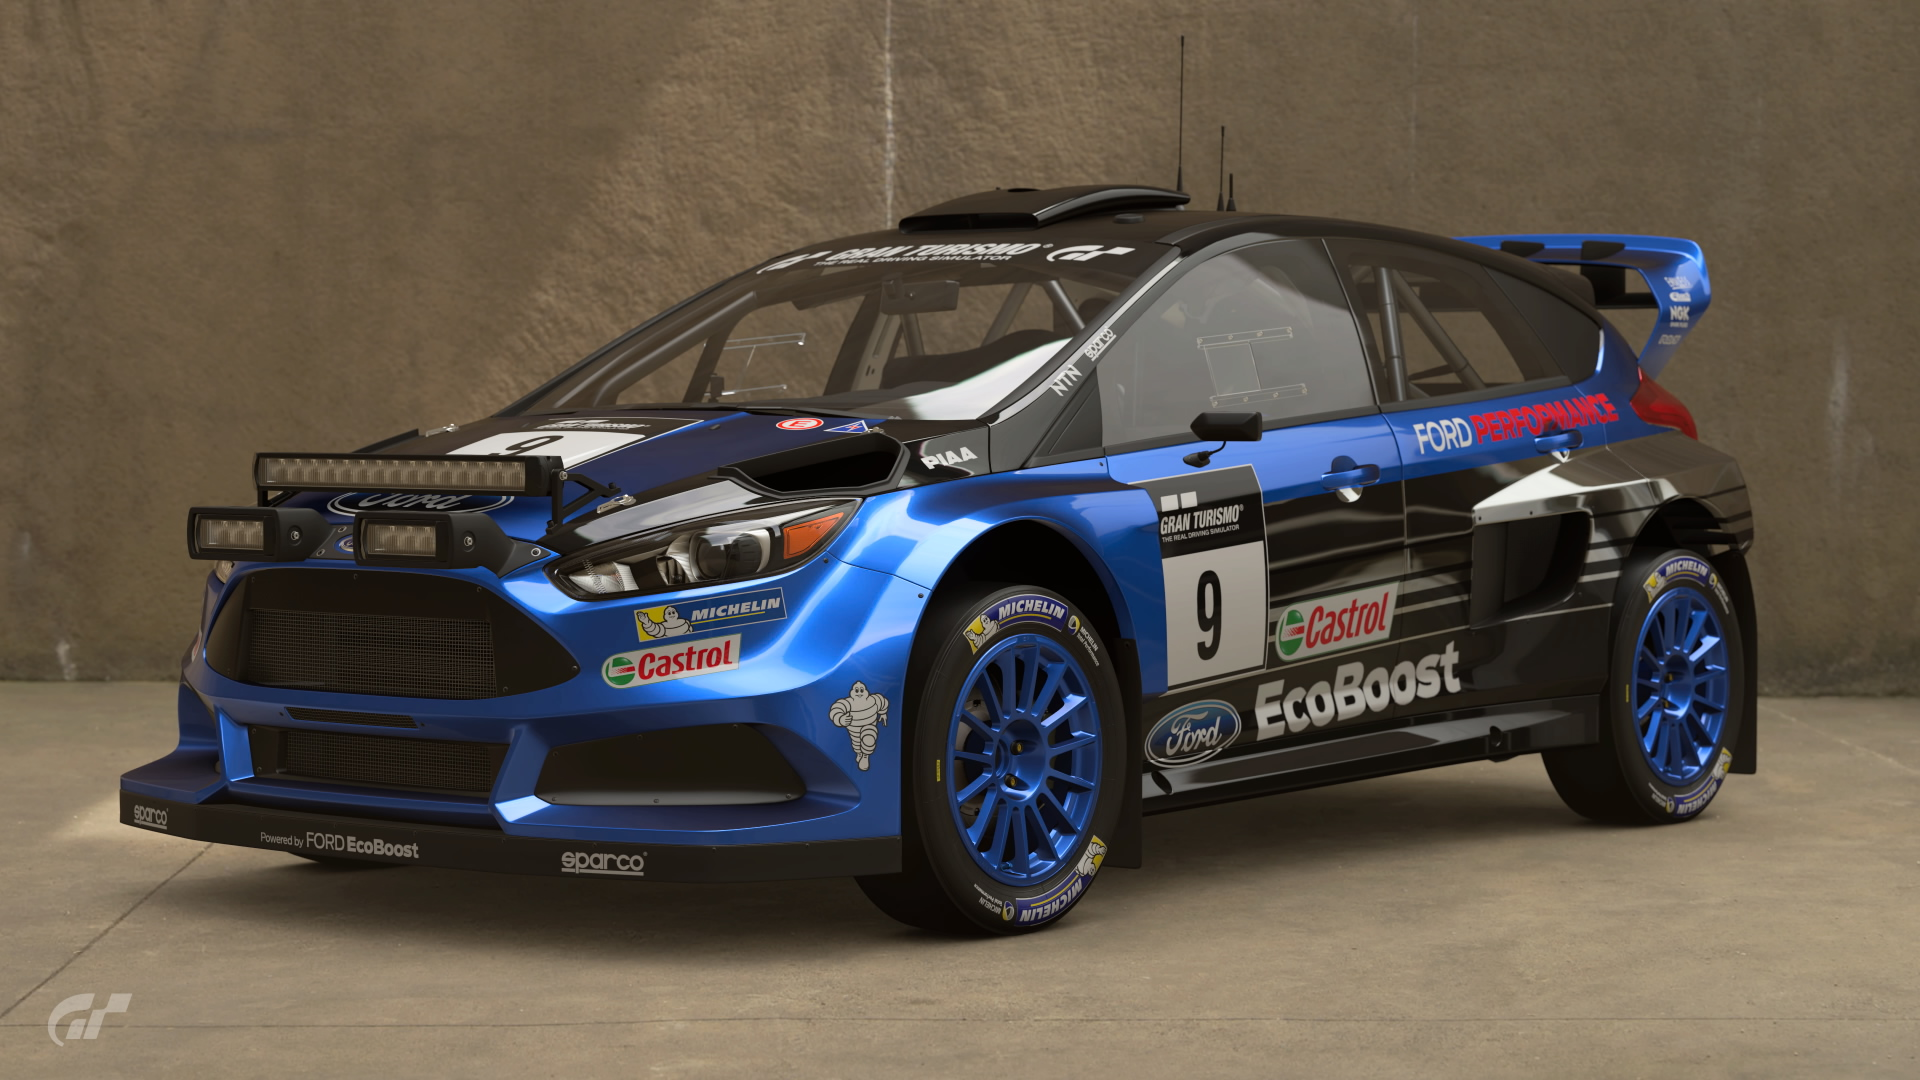 Ford Focus Gr.B Rally Car   Gran Turismo Wiki   FANDOM powered by Wikia